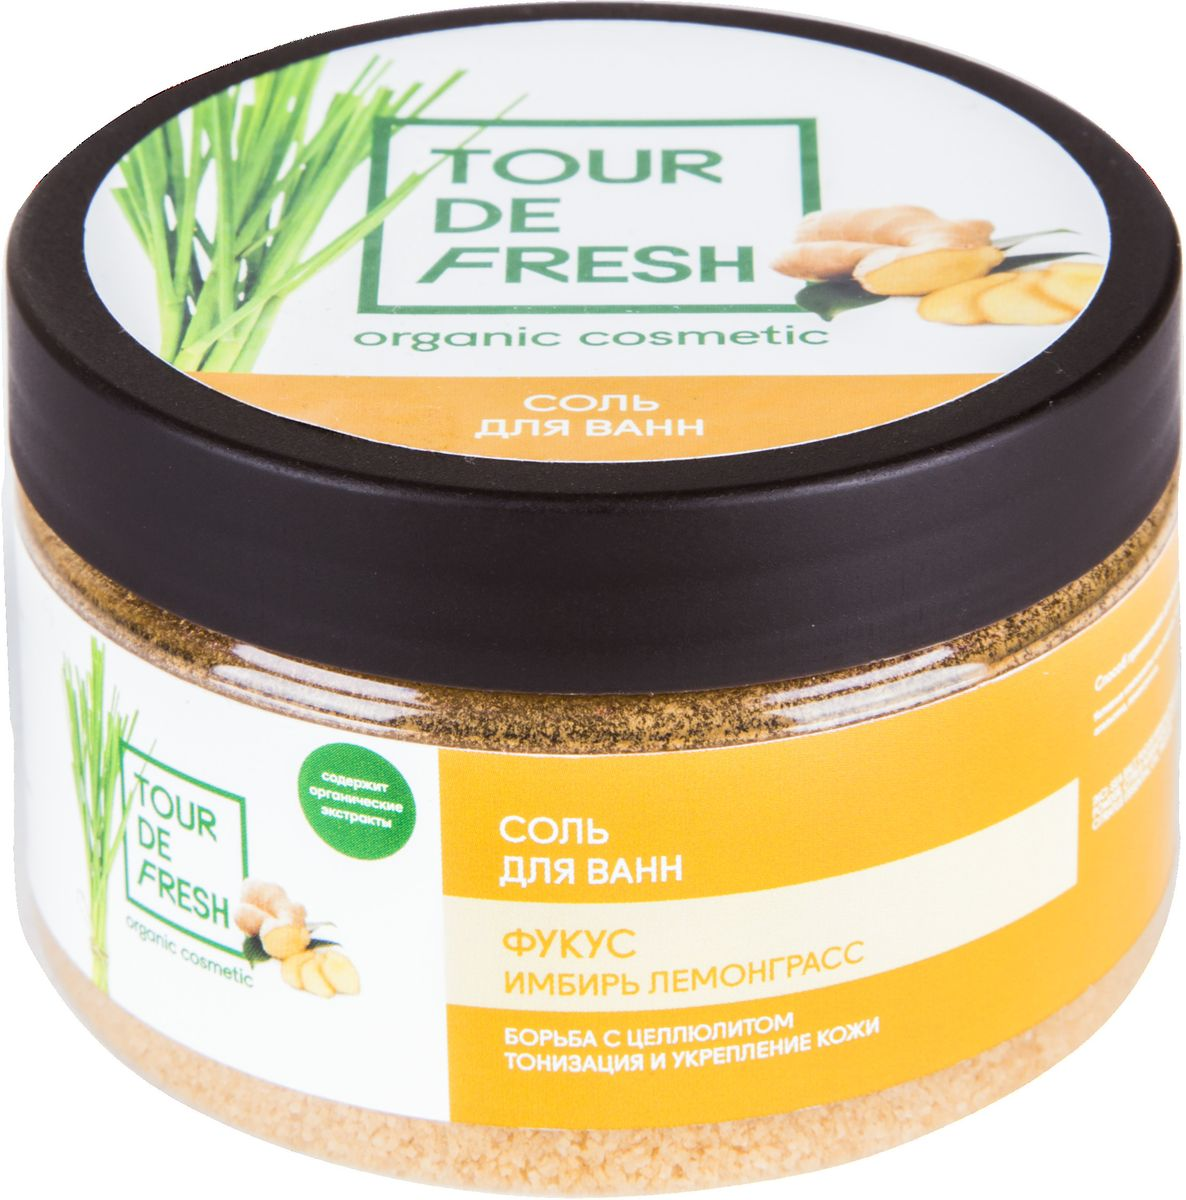 Tour De Fresh Соль для ванн Антицеллюлитная, 200 мл - Косметика по уходу за кожей